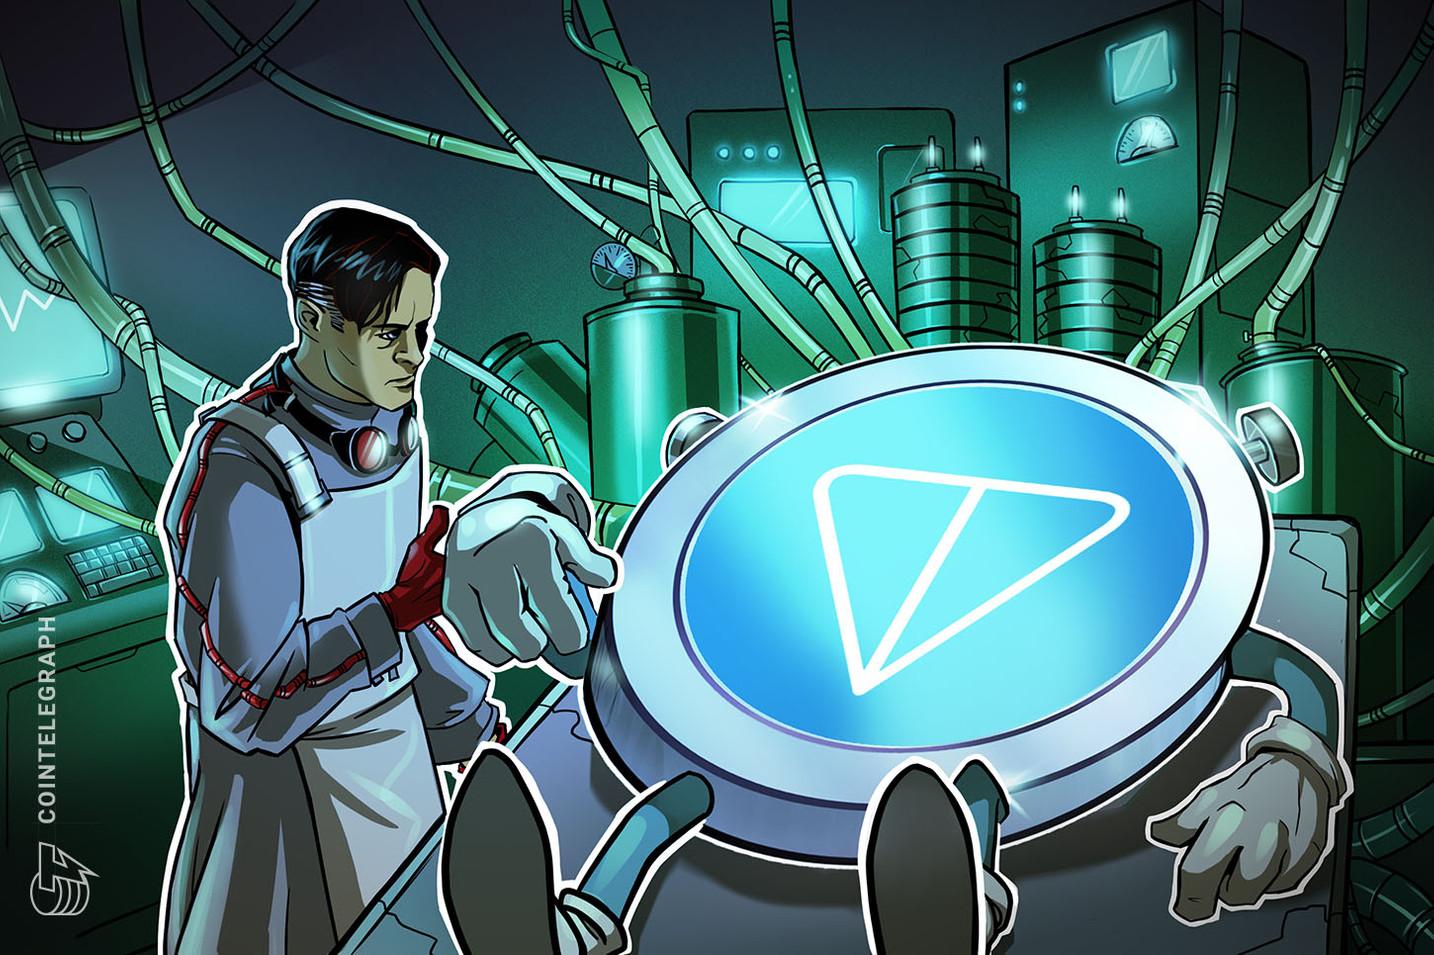 La SEC vince: Telegram abbandonerà Telegram Open Network e il token Gram